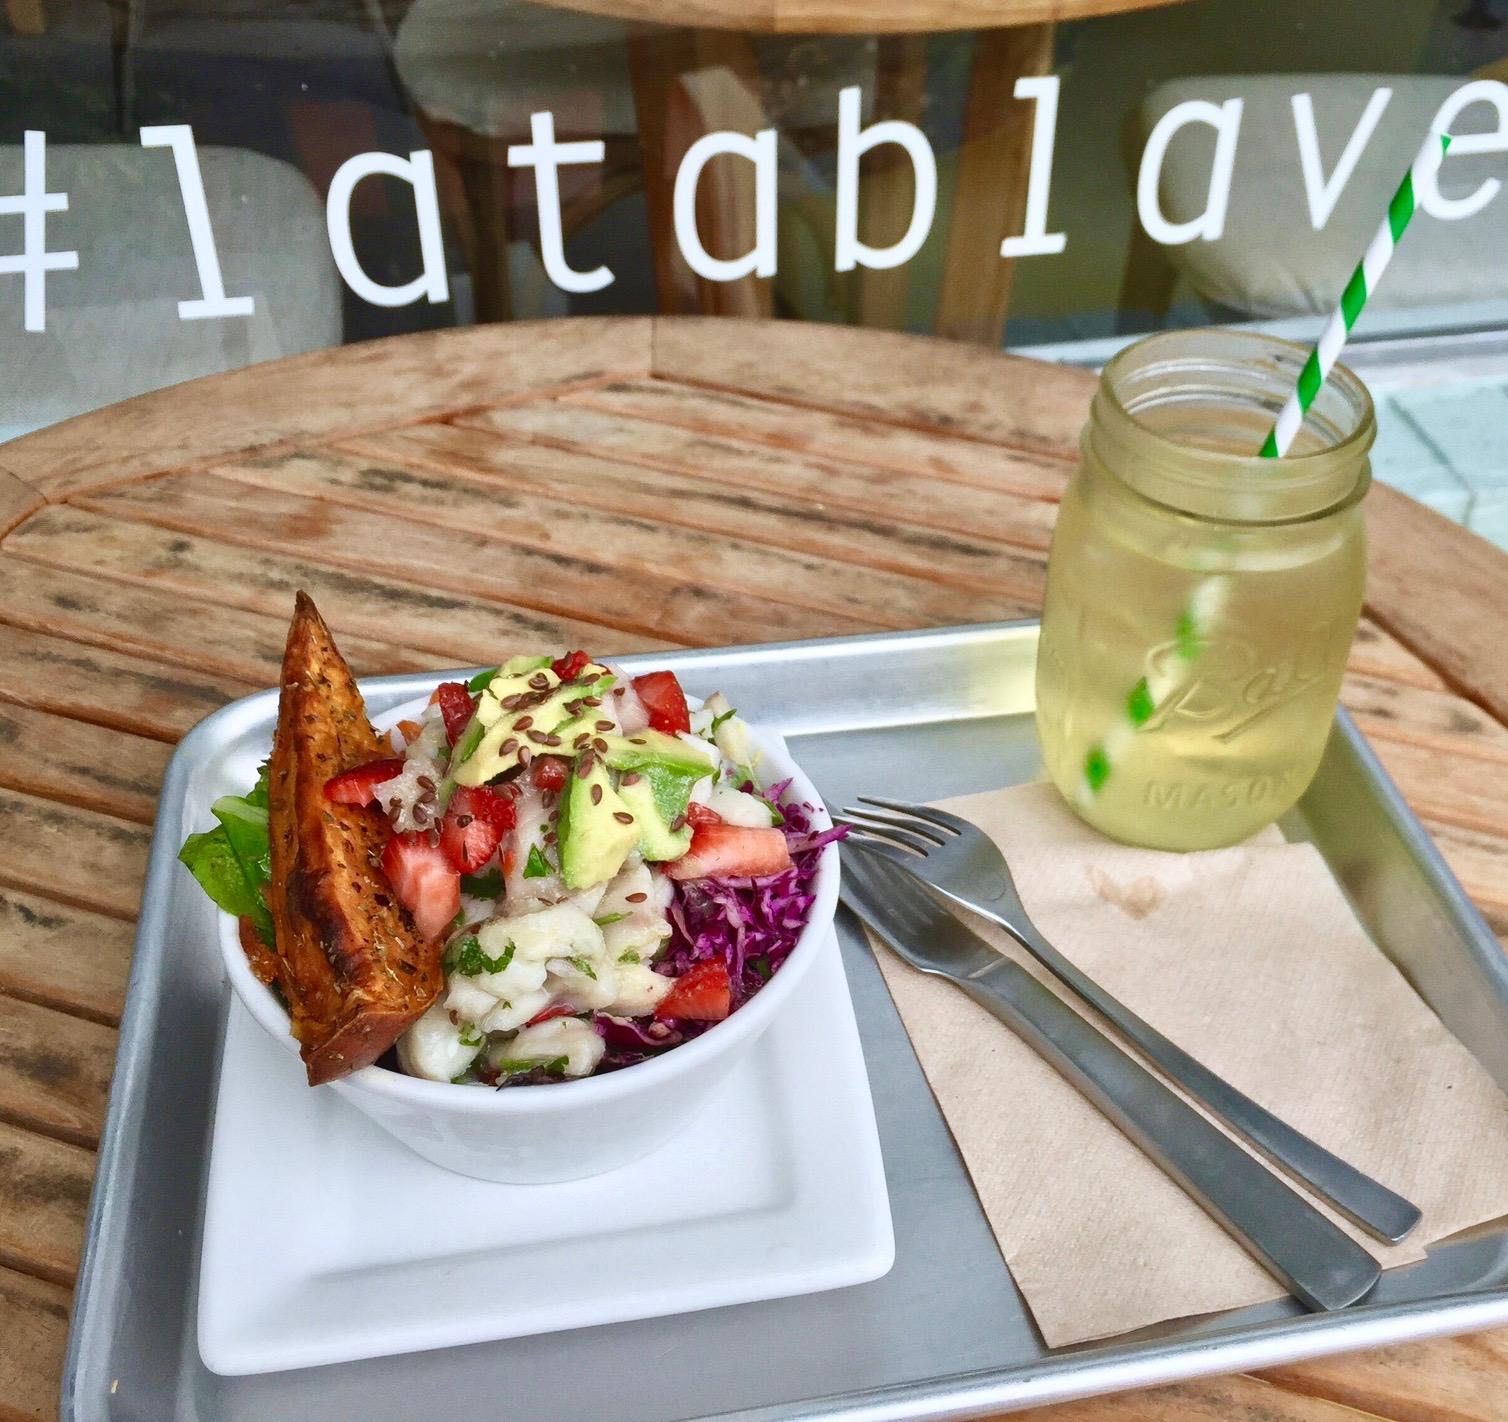 Mahi Ceviche salad